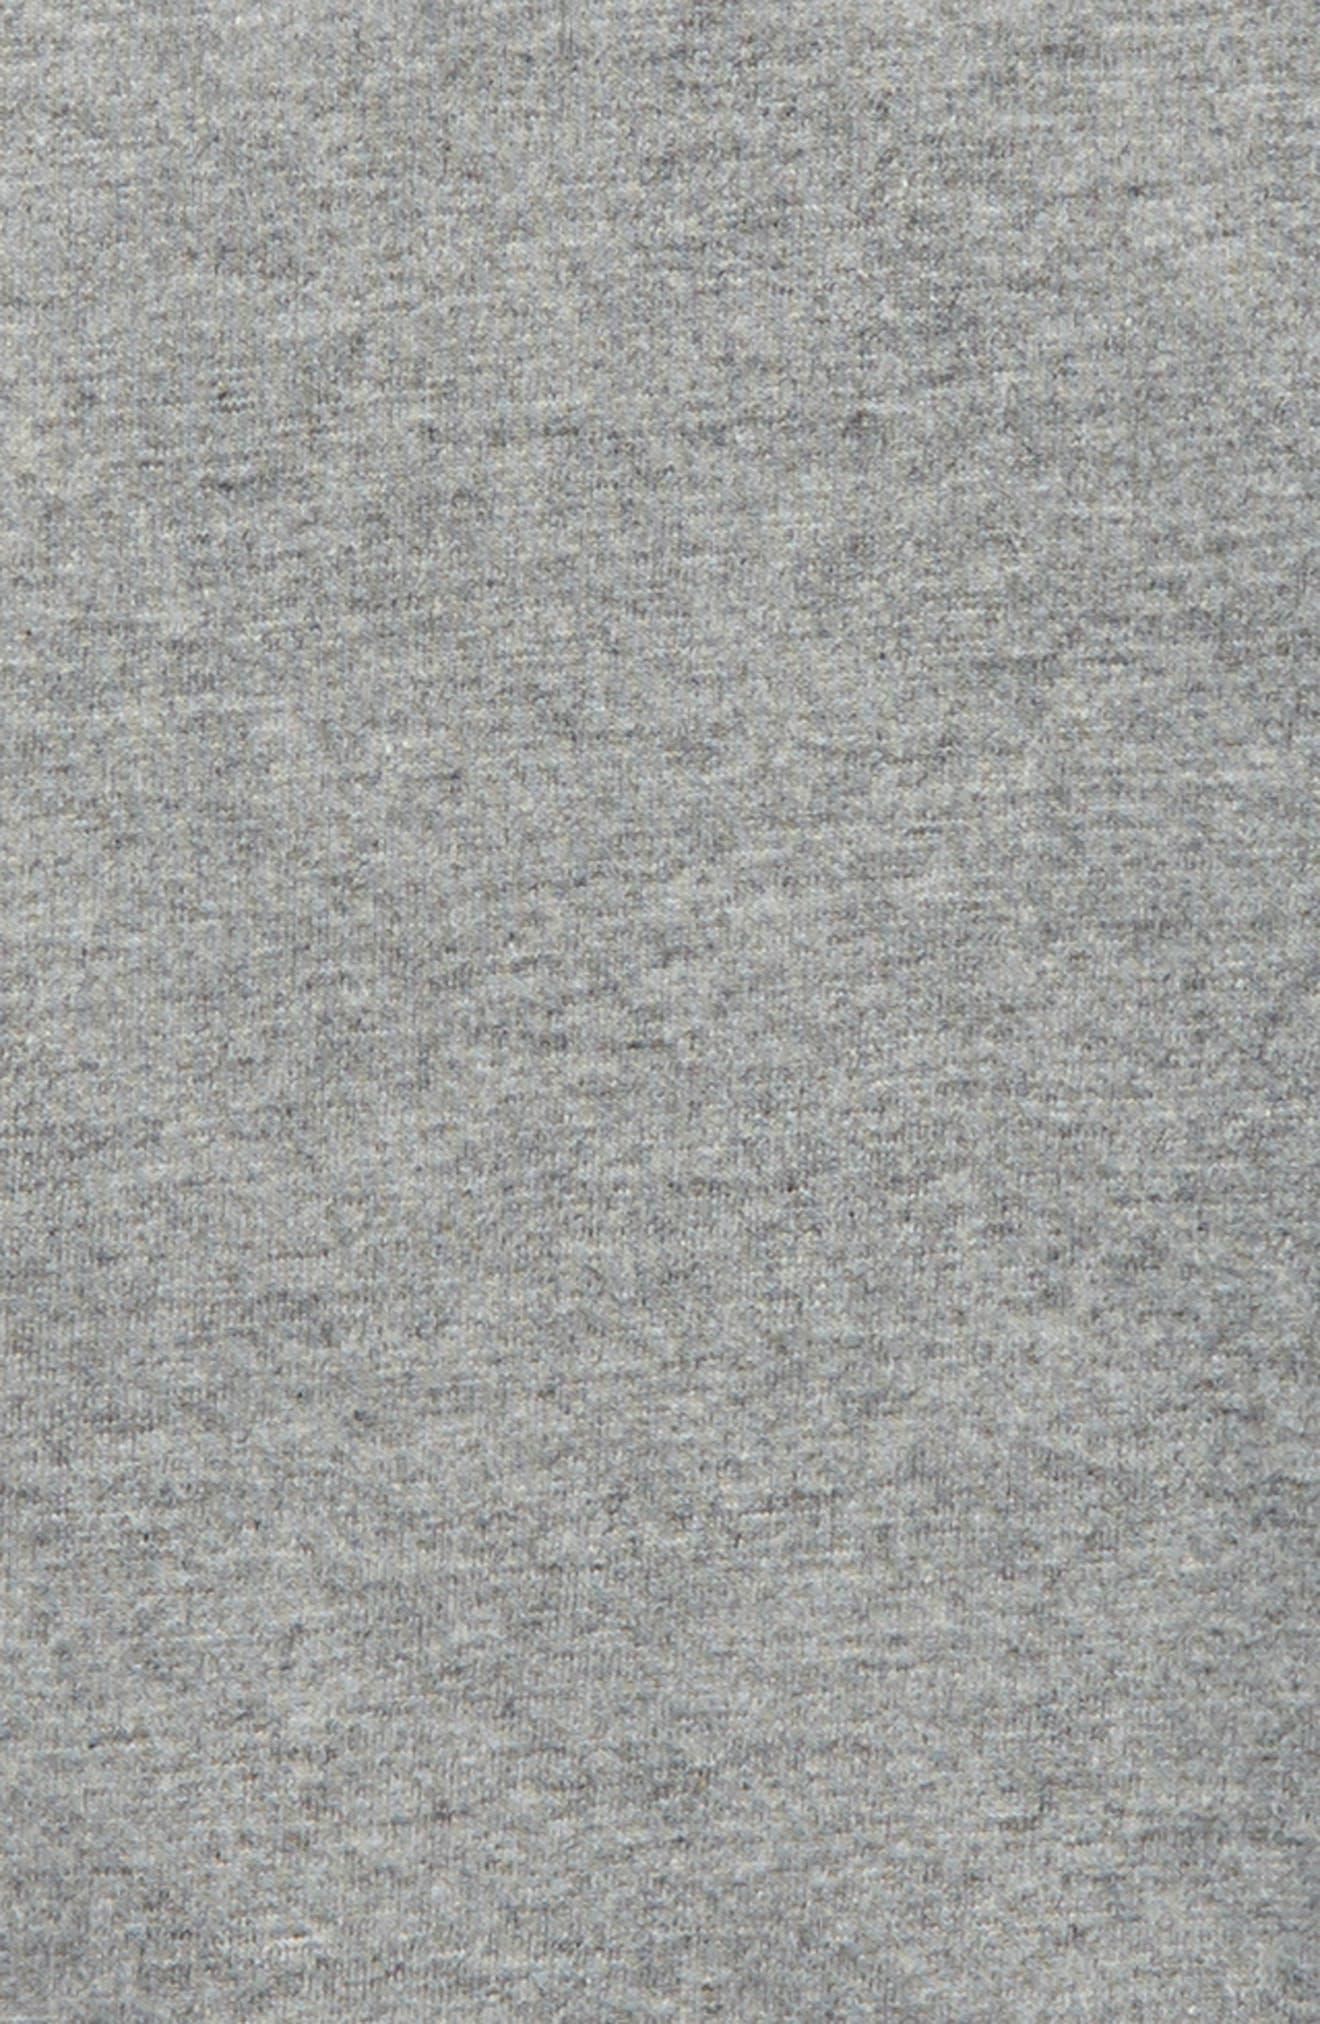 Alternate Image 2  - Mini Boden Shaggy Lined Sweatshirt (Little Boys & Big Boys)